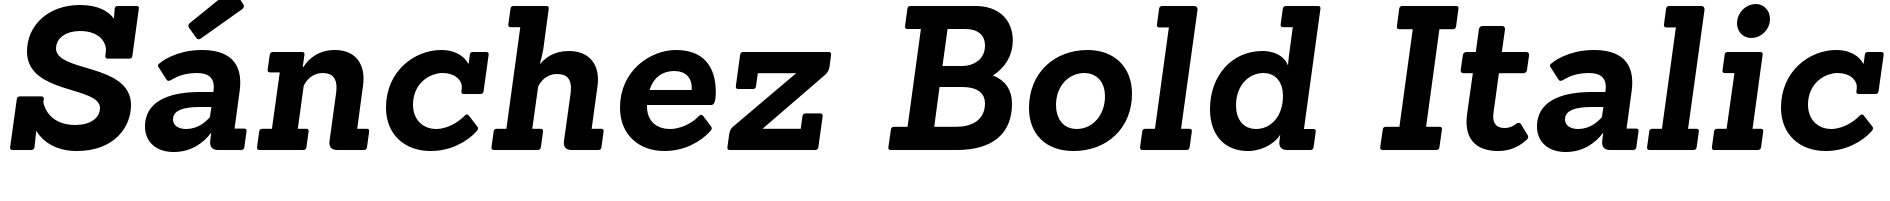 Sánchez Bold Italic